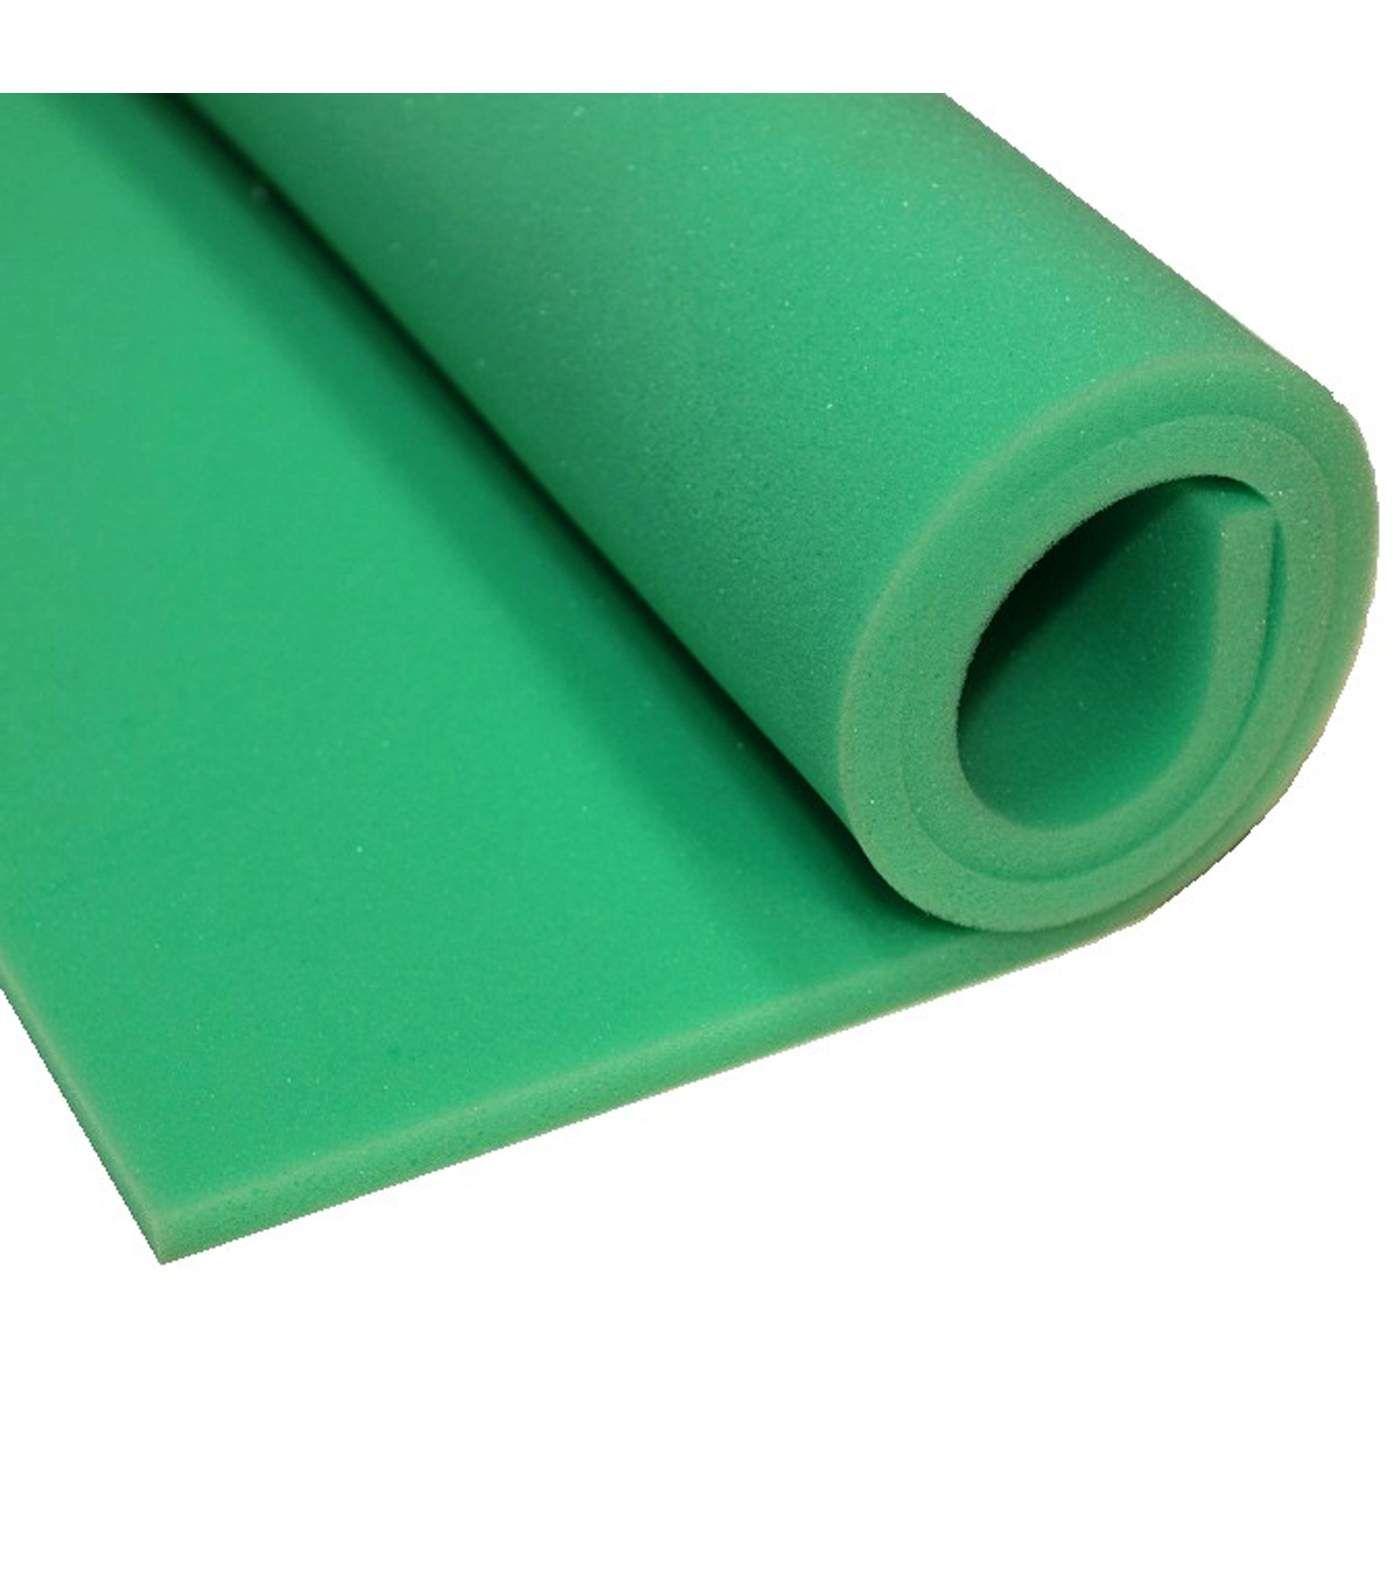 polyurethane sofa repair gray tufted the high density foam slab 5 x 24 90 original and